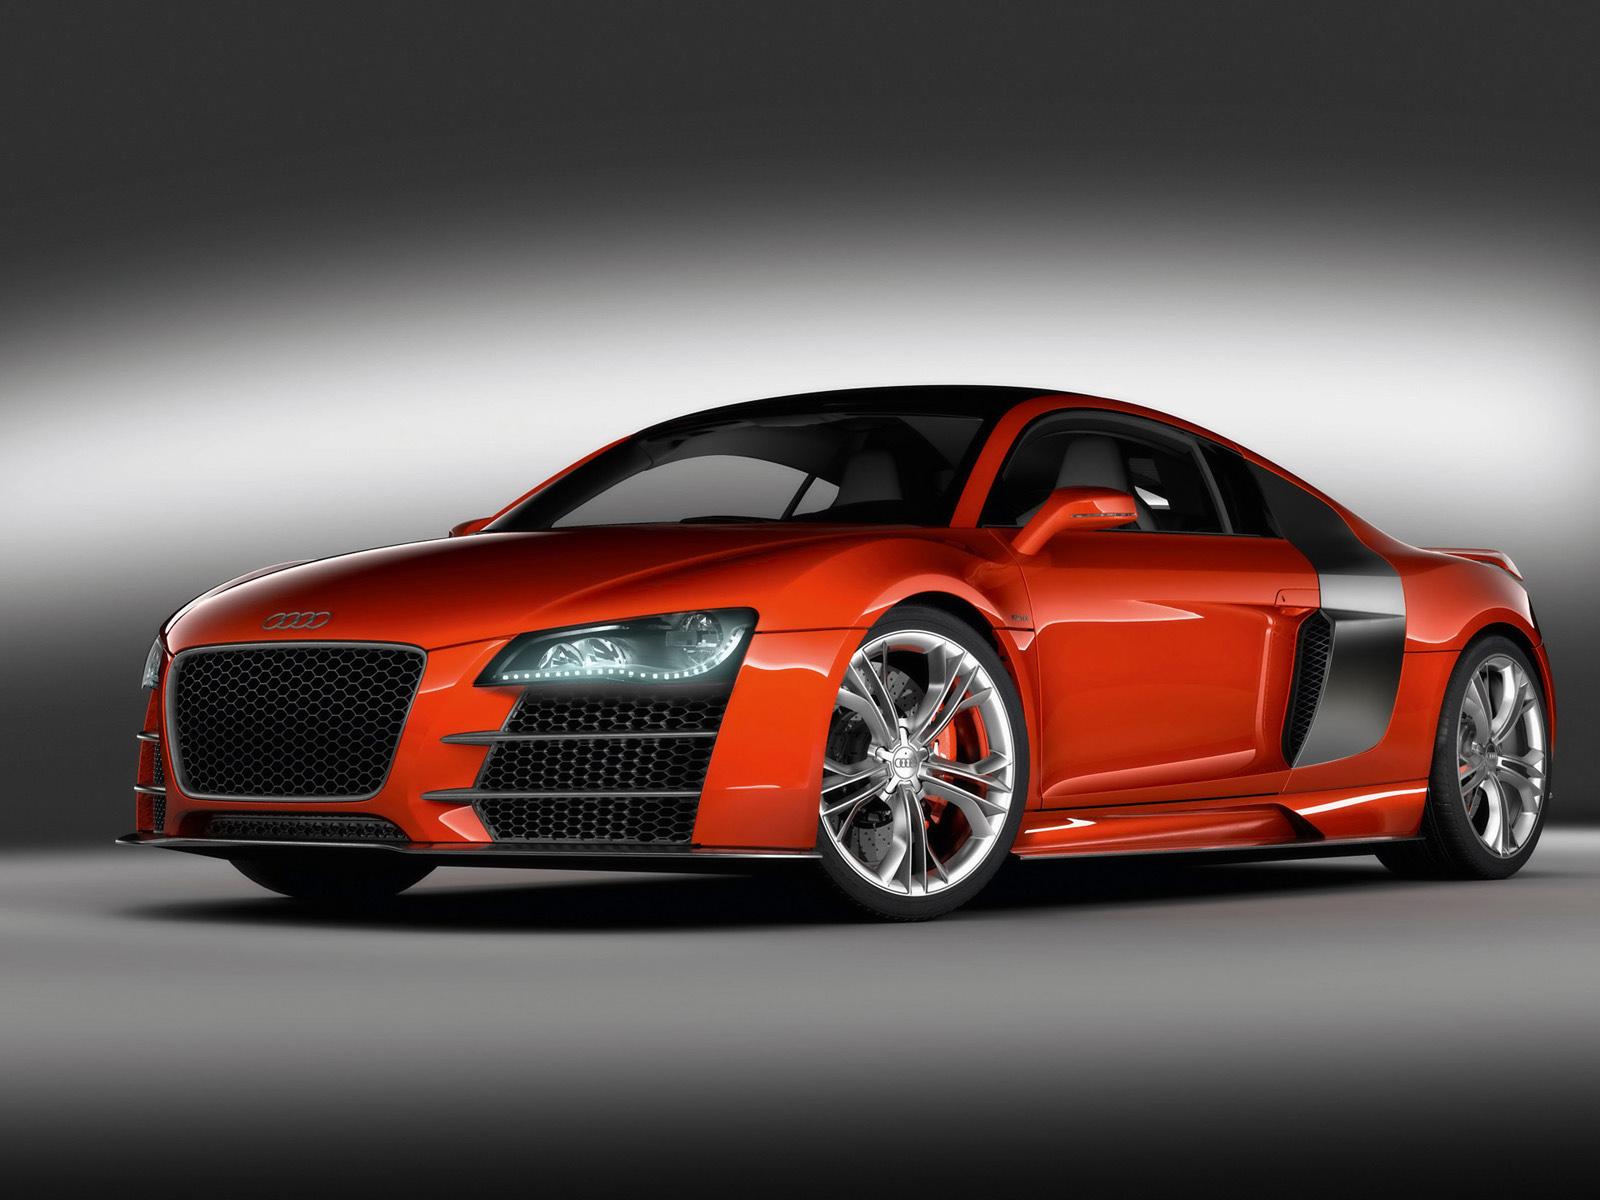 http://1.bp.blogspot.com/_rL1wtoHITCk/S-6_MGaM15I/AAAAAAAABug/z8K1TBPd0lM/s1600/Audi+R8+TDI+LeMans+02.jpg